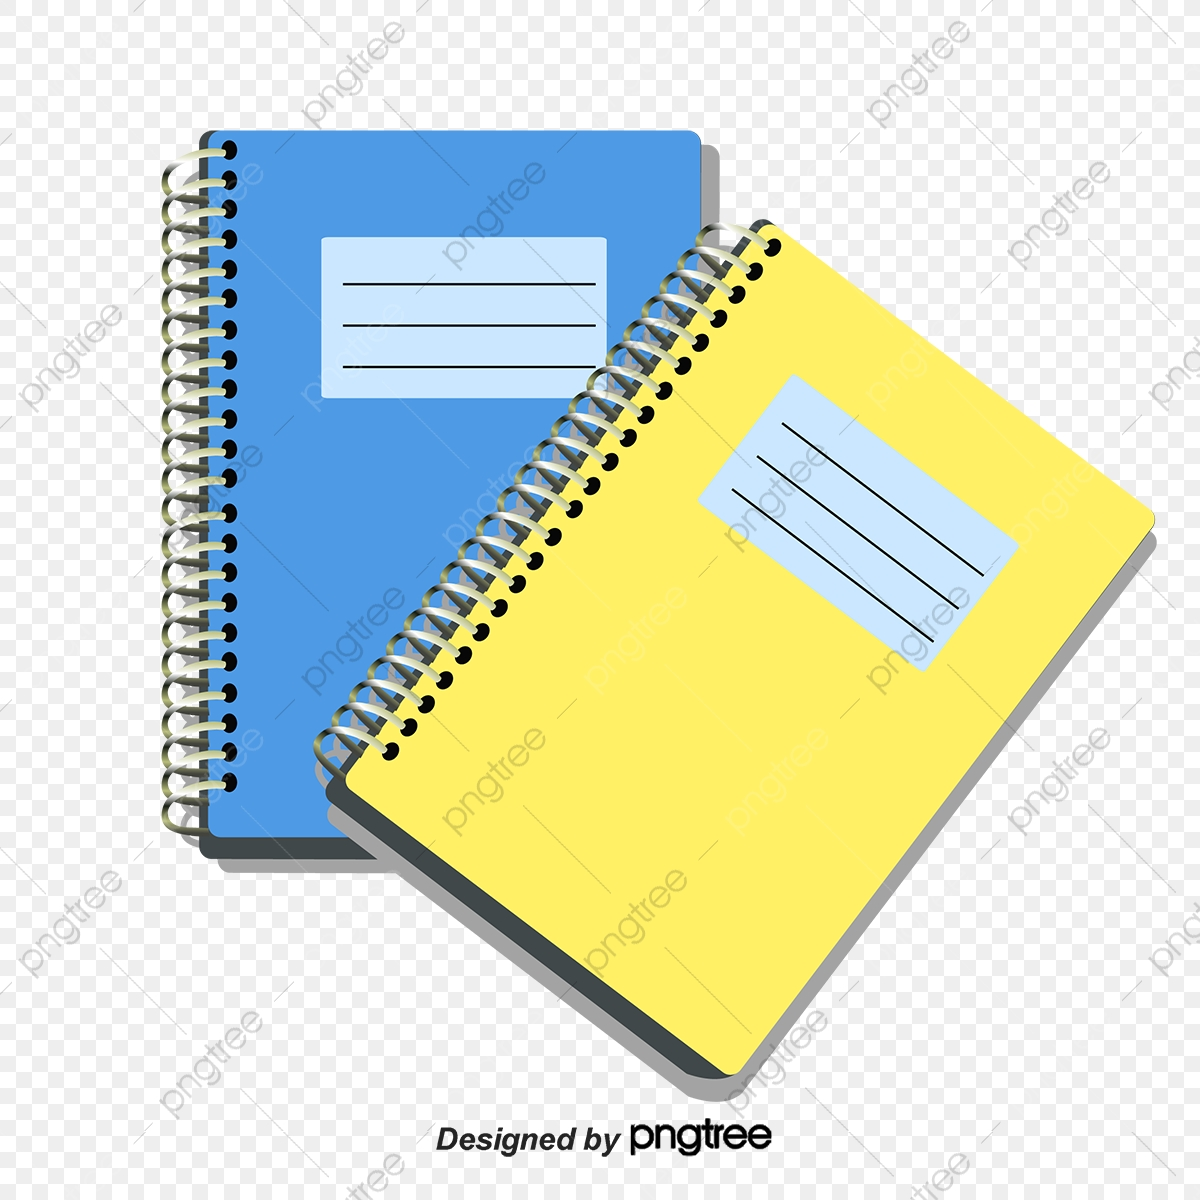 notebook clipart - Clip Art Library